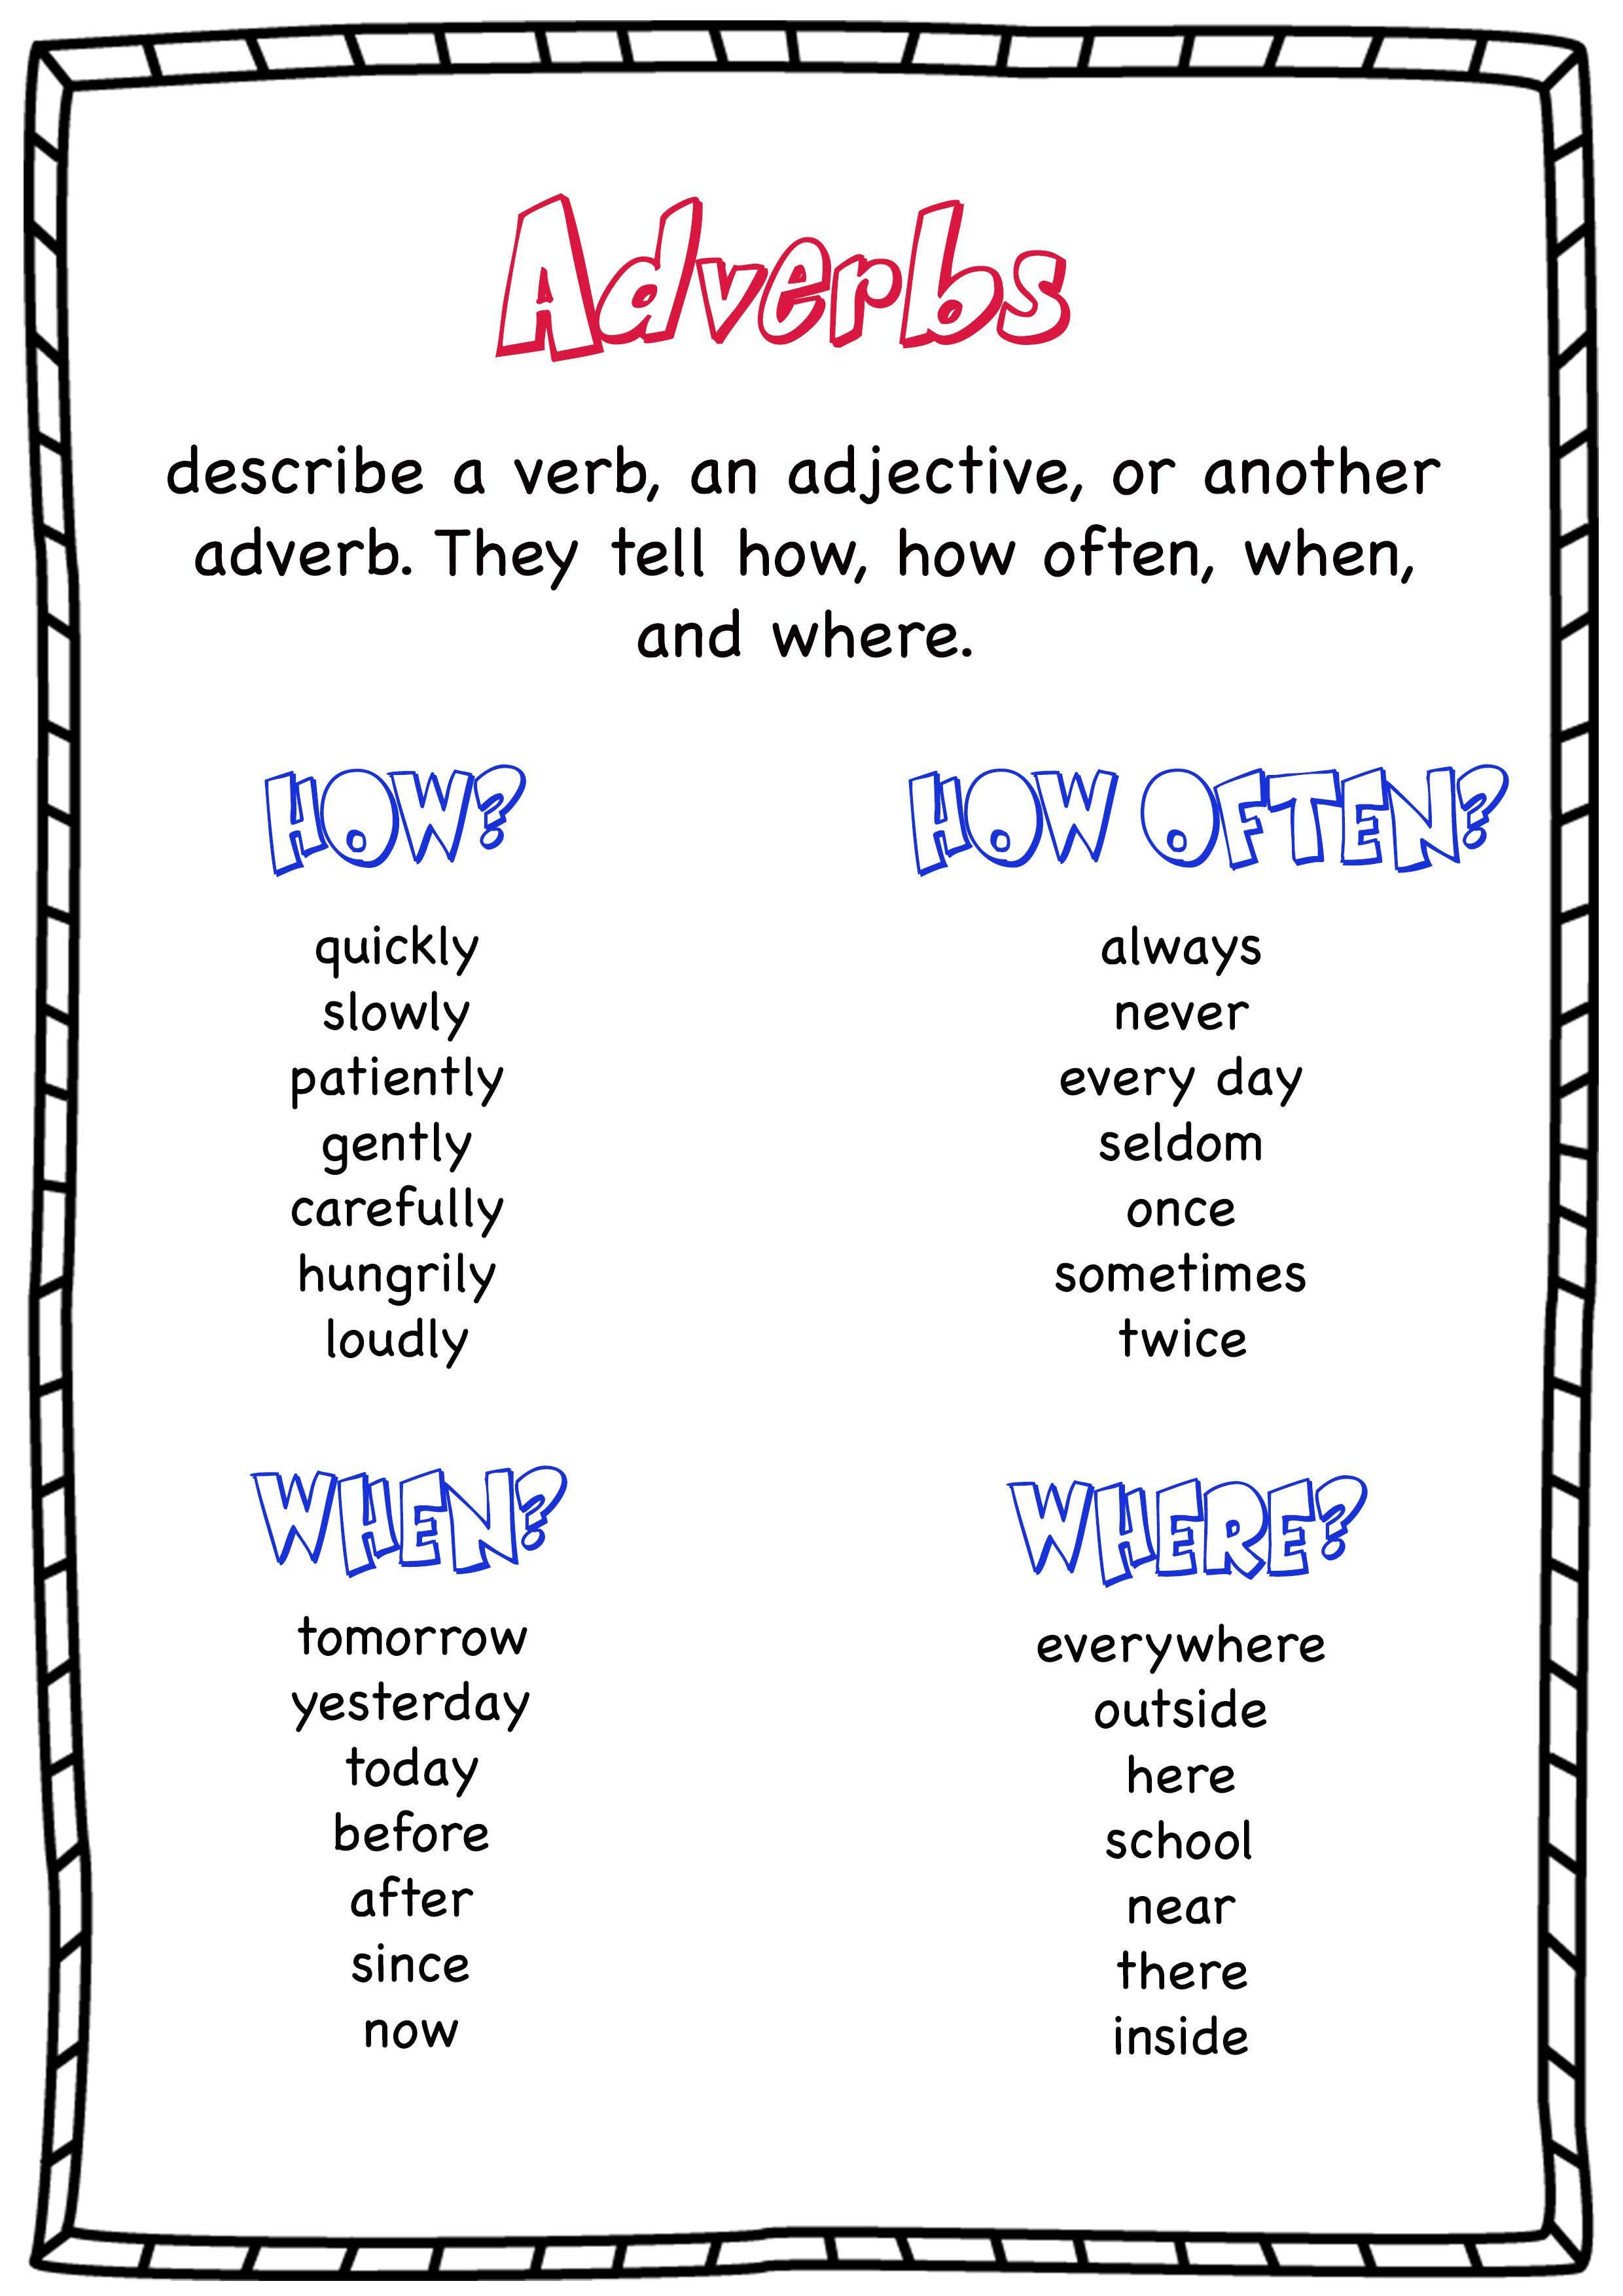 Adverbs Worksheets Adverbs Worksheet Adverbs Adjectives